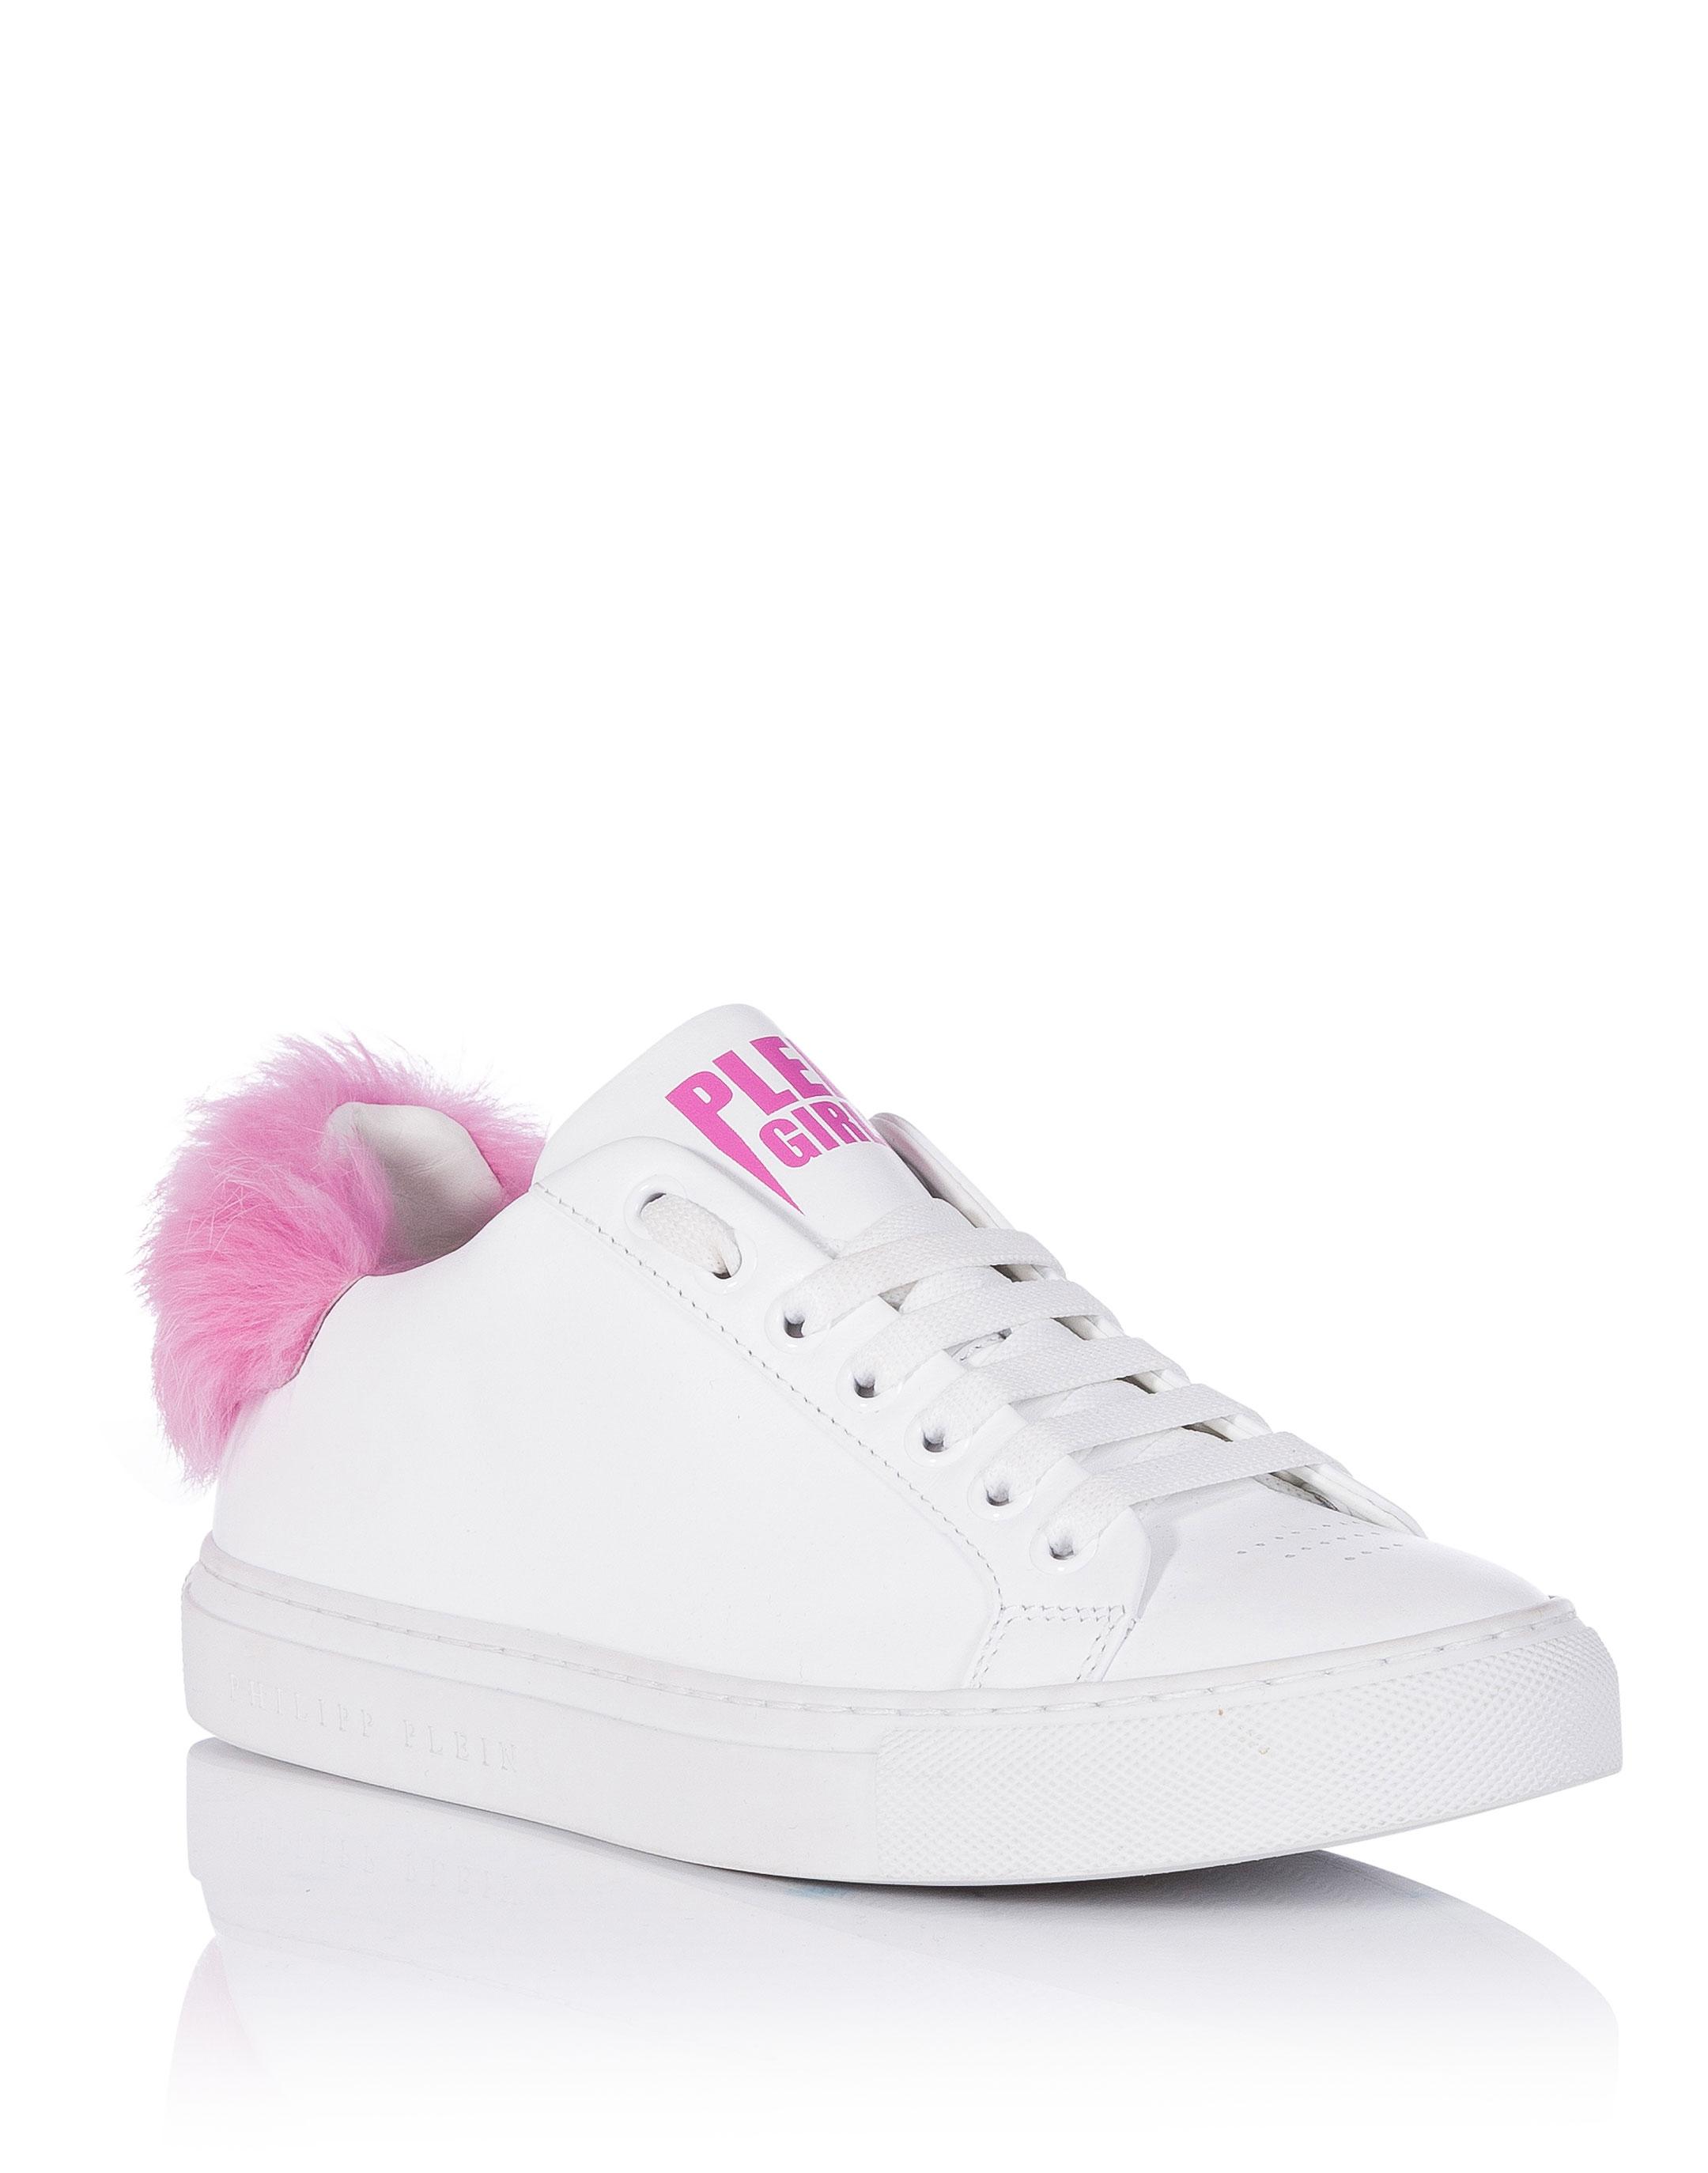 Philipp Plein Slumber Party sneakers WecNcI5s